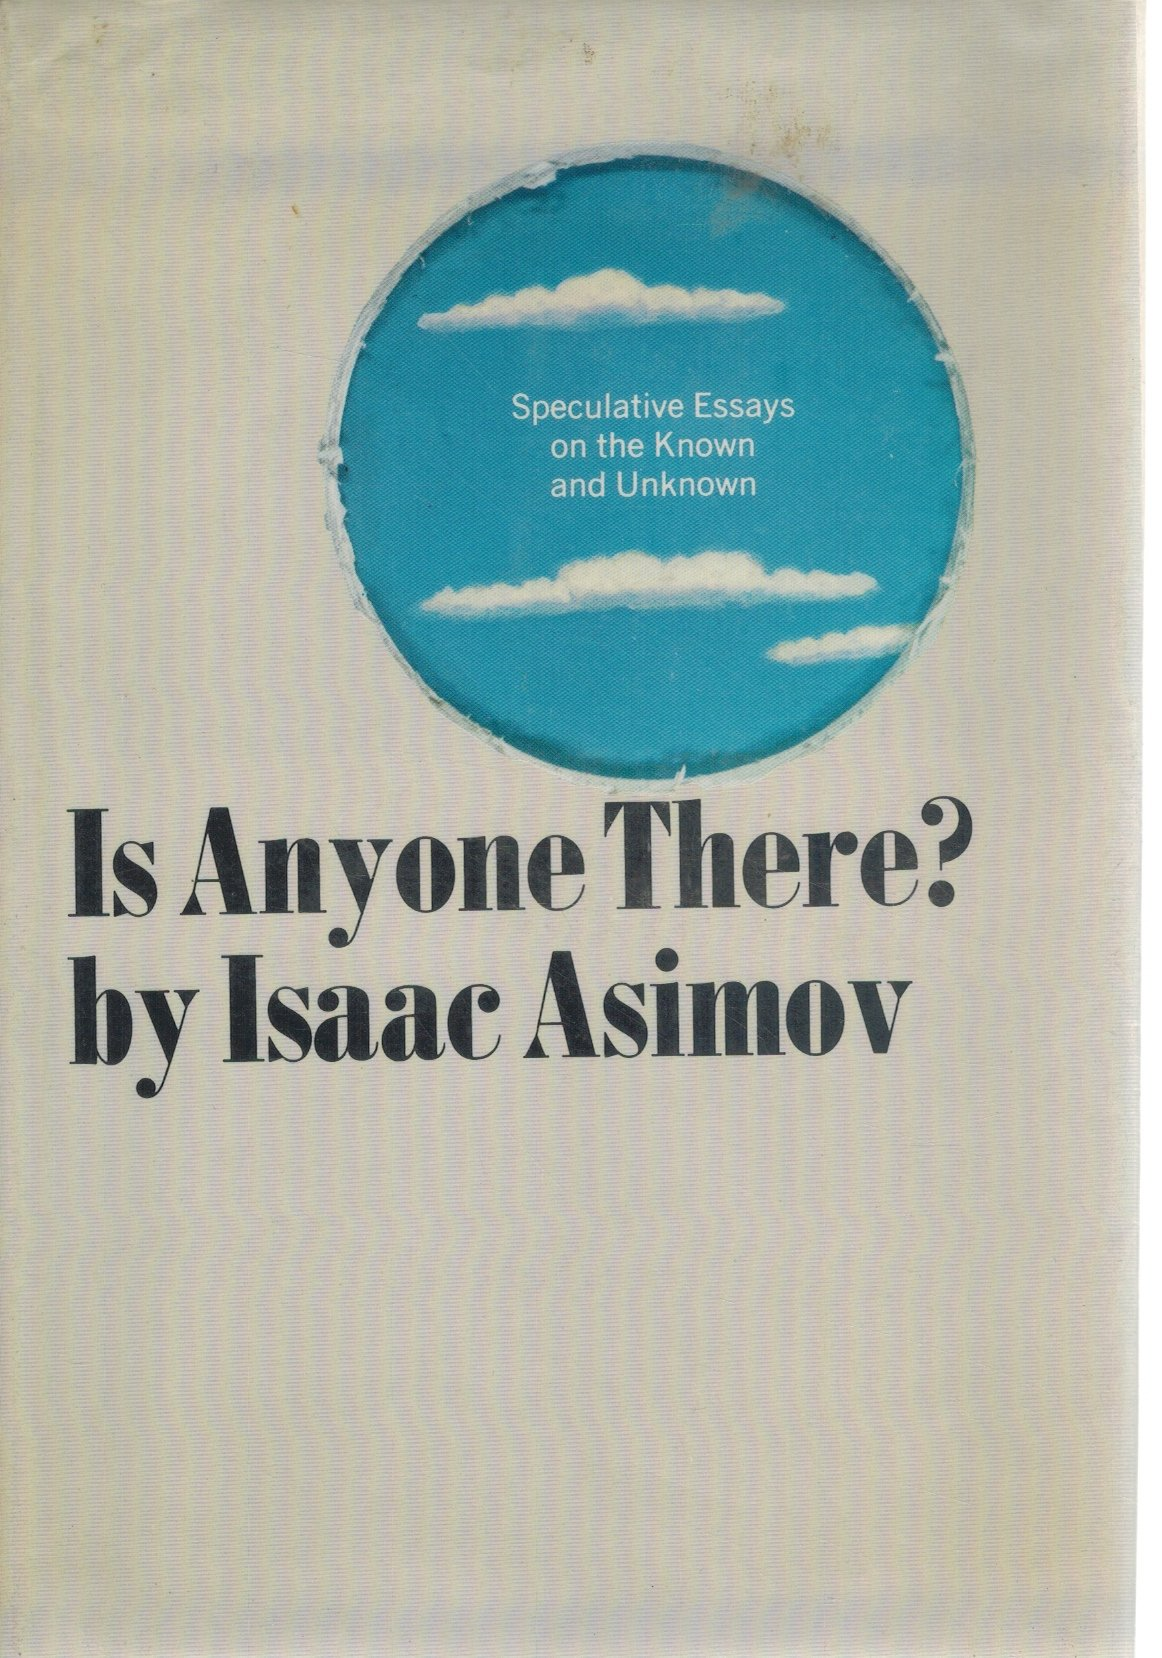 008 81xccmq2bmol Essay Example Isaac Asimov Awful Essays On Creativity Intelligence Full